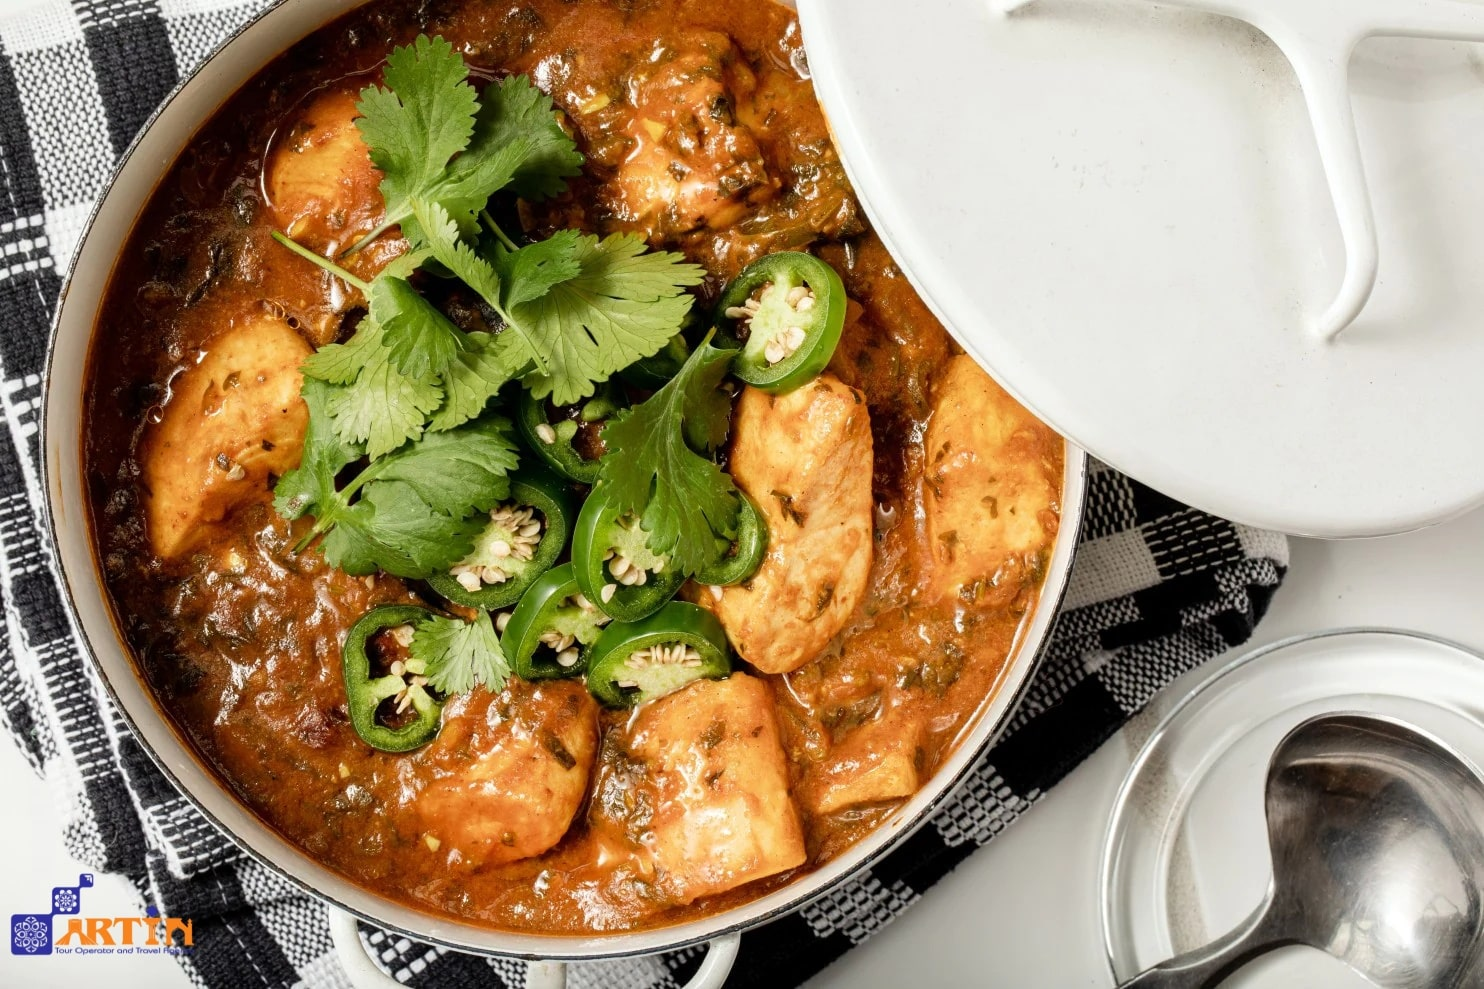 Ghalieh Mahi Iranian fish and tumeric dish